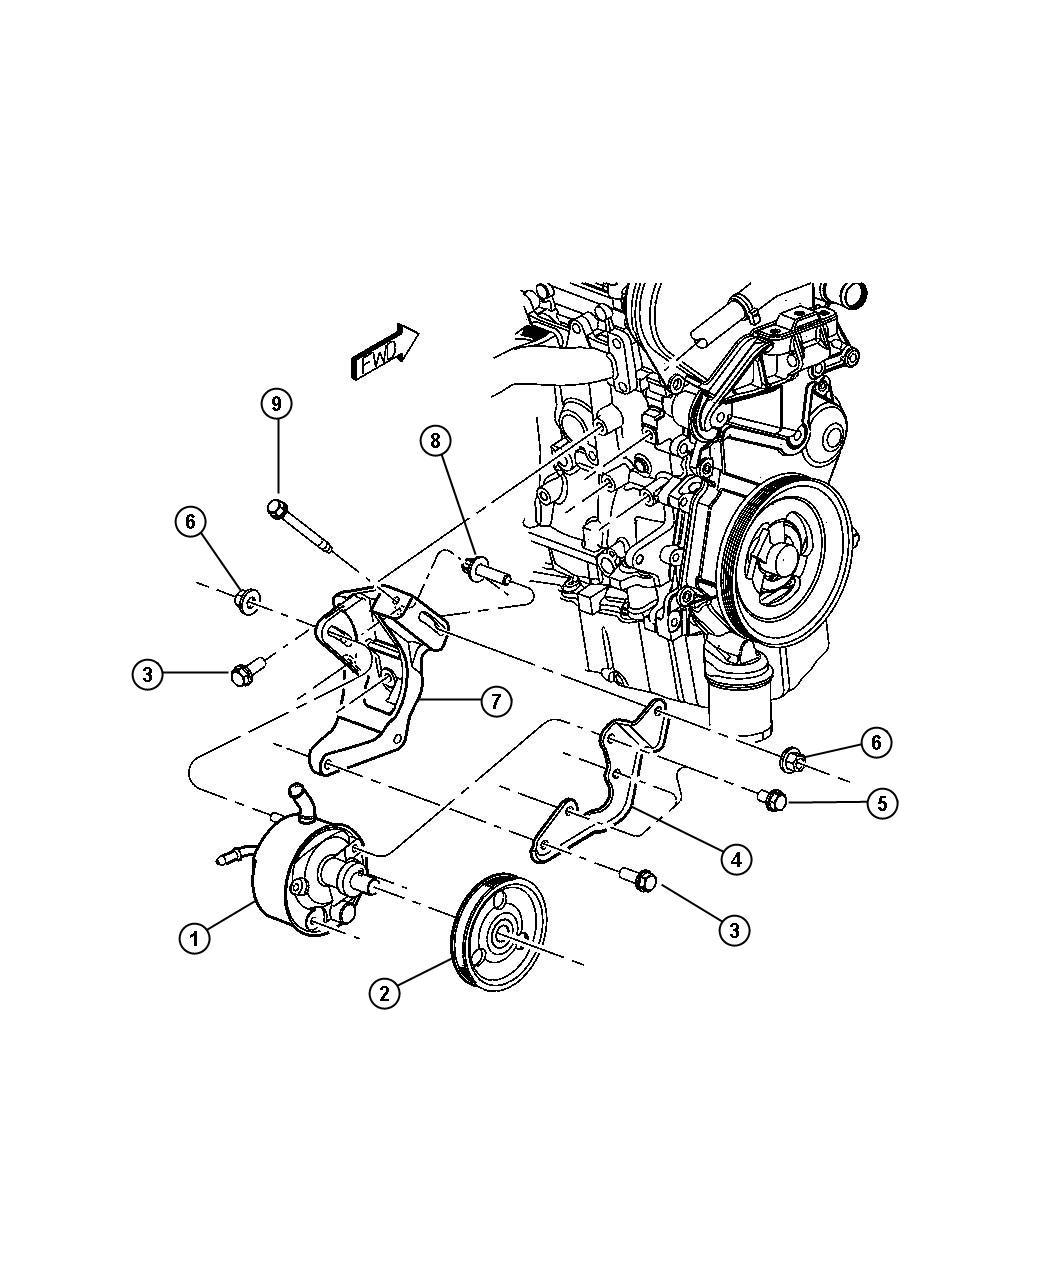 2003 Chrysler Voyager Pulley. Power steering pump. Engine